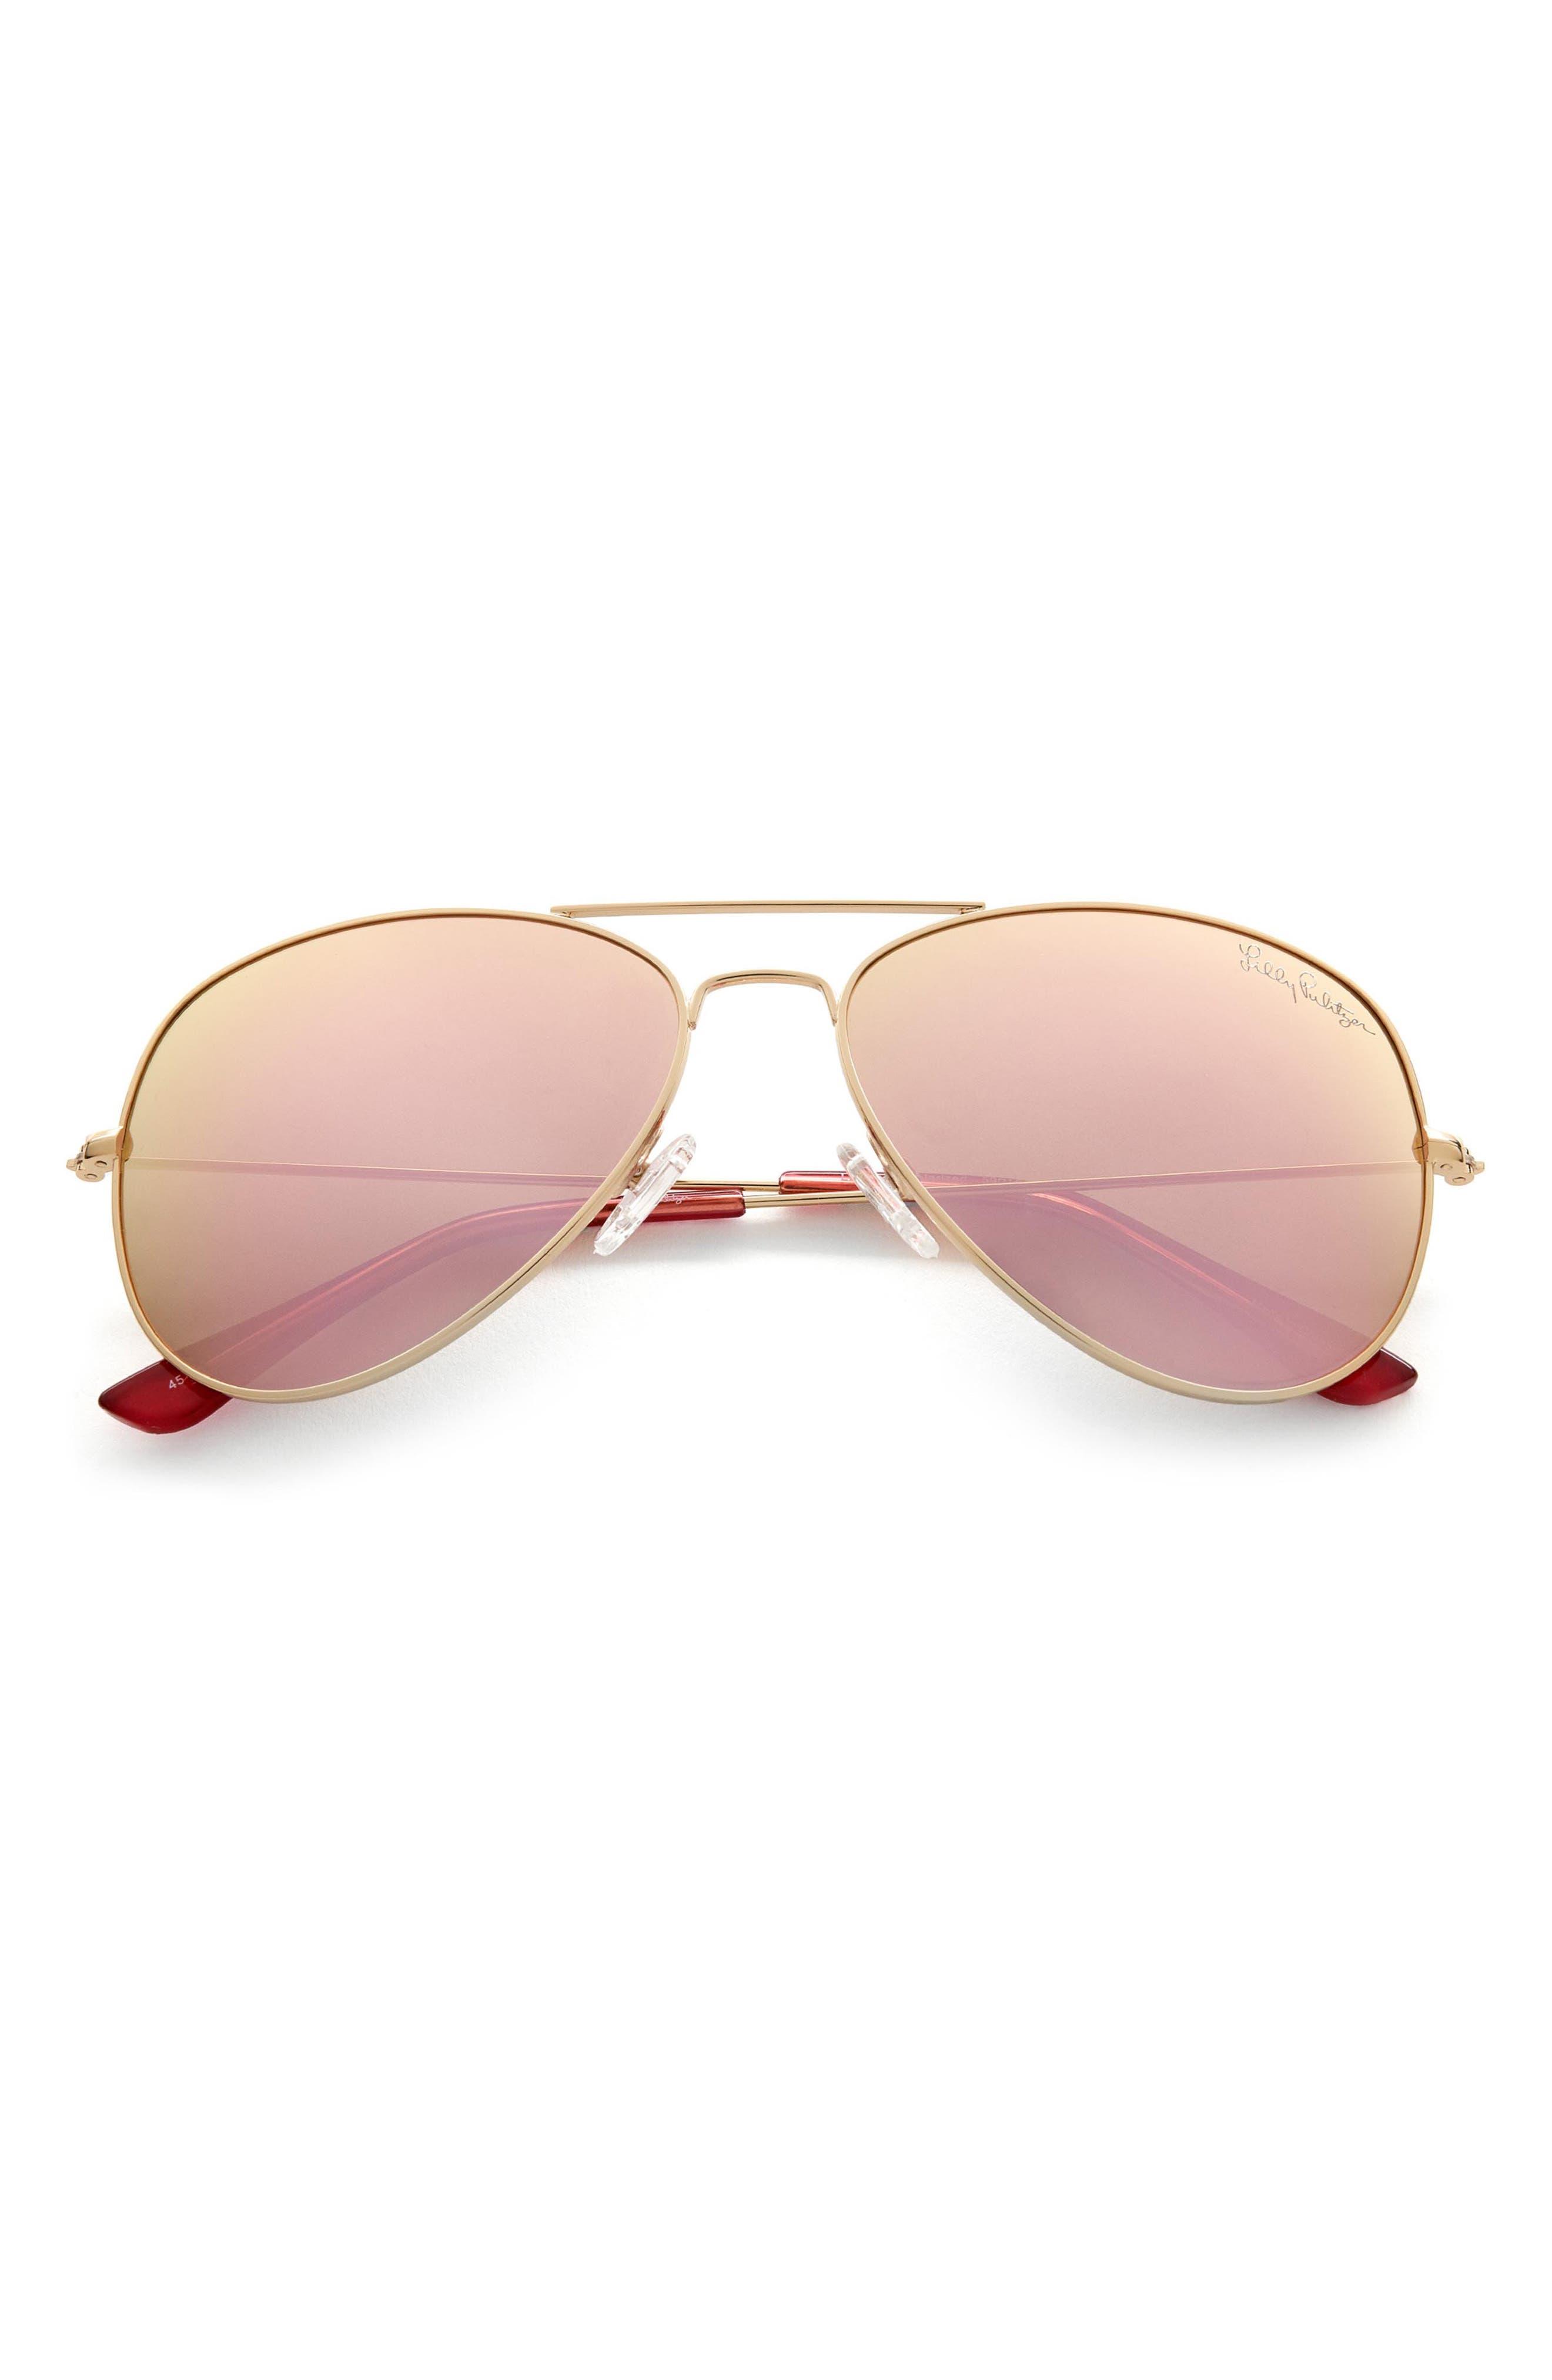 Women's Lilly Pulitzer Lexy 59mm Polarized Aviator Sunglasses